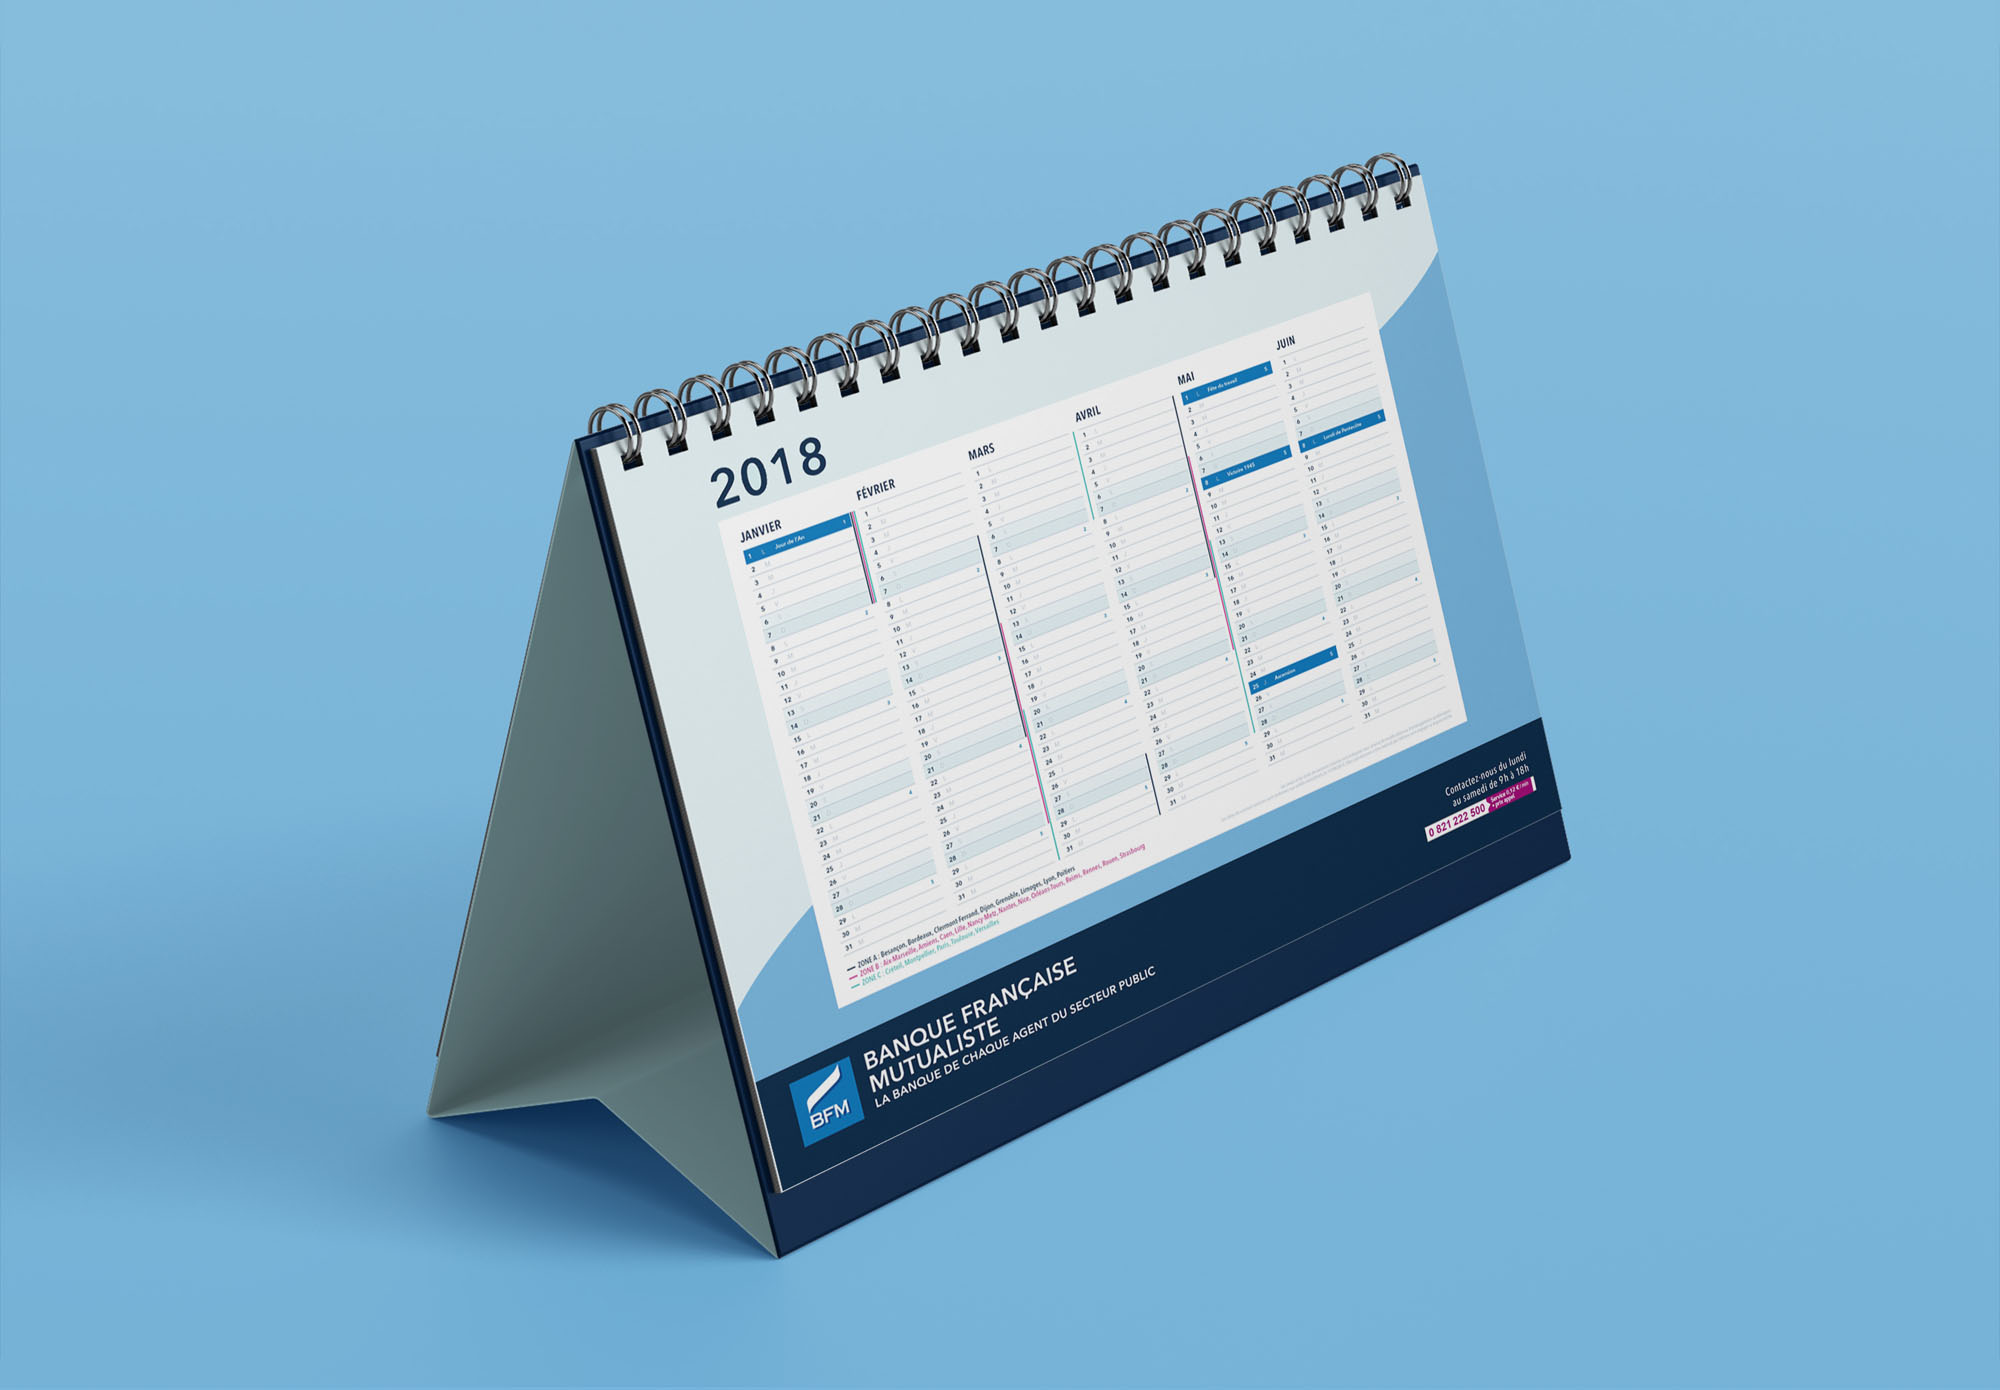 BFM - Banque Française Mutualiste - calendrier